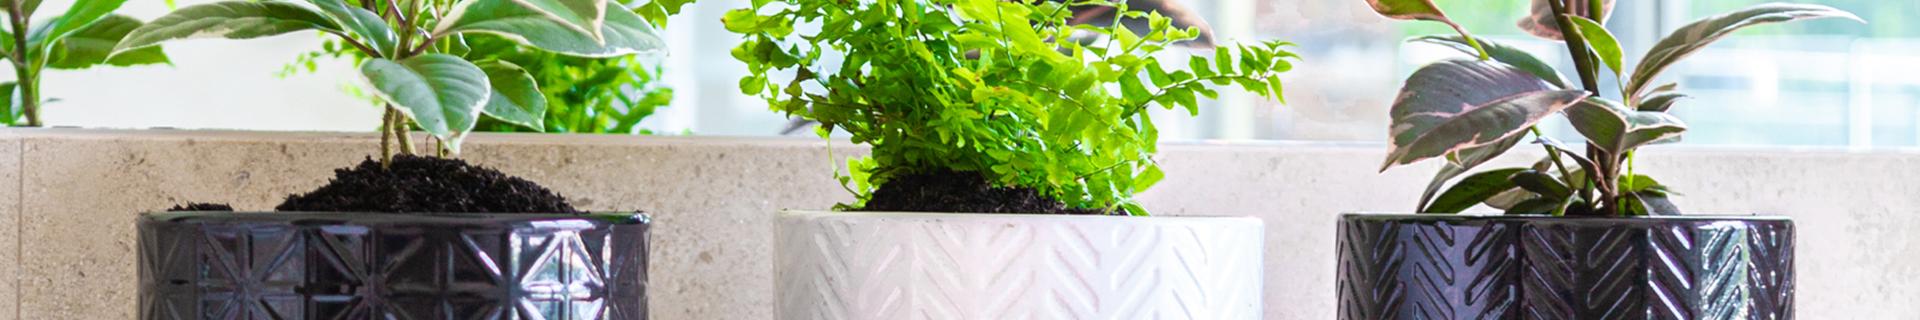 Three plants in small indoor pots